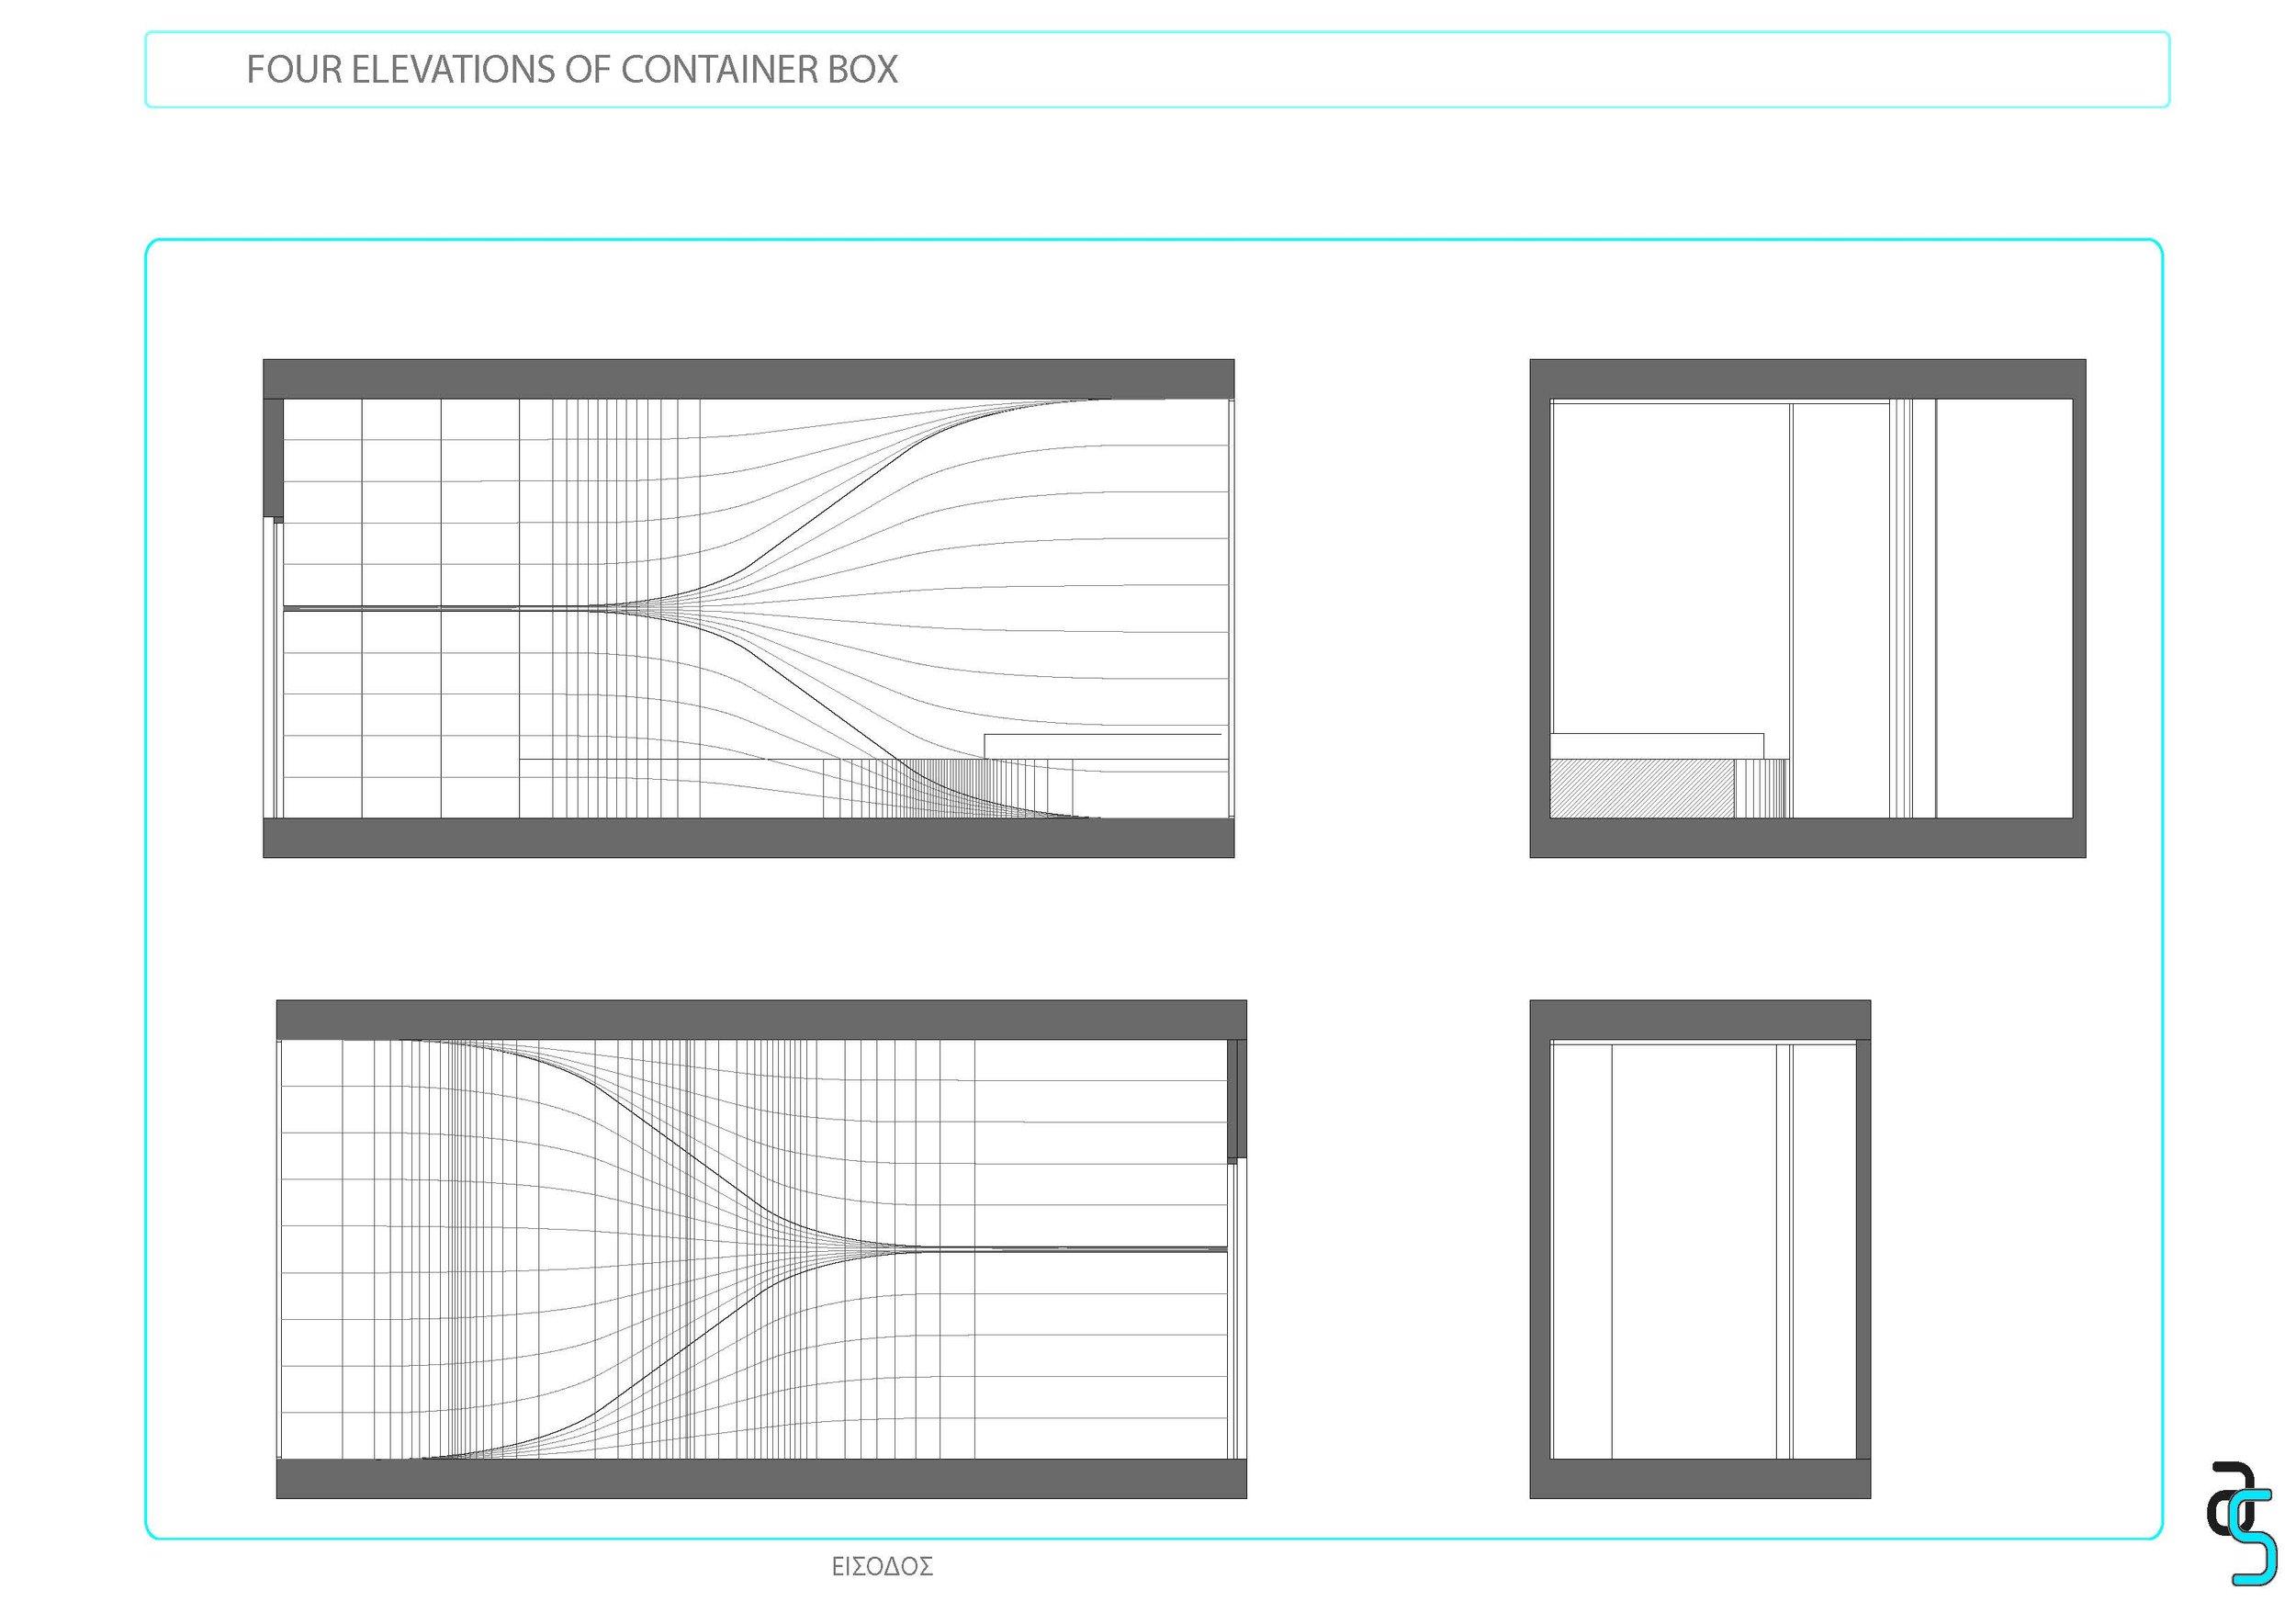 Portfolio ArchitectScripta 0131 - 1732__Page_251.jpg